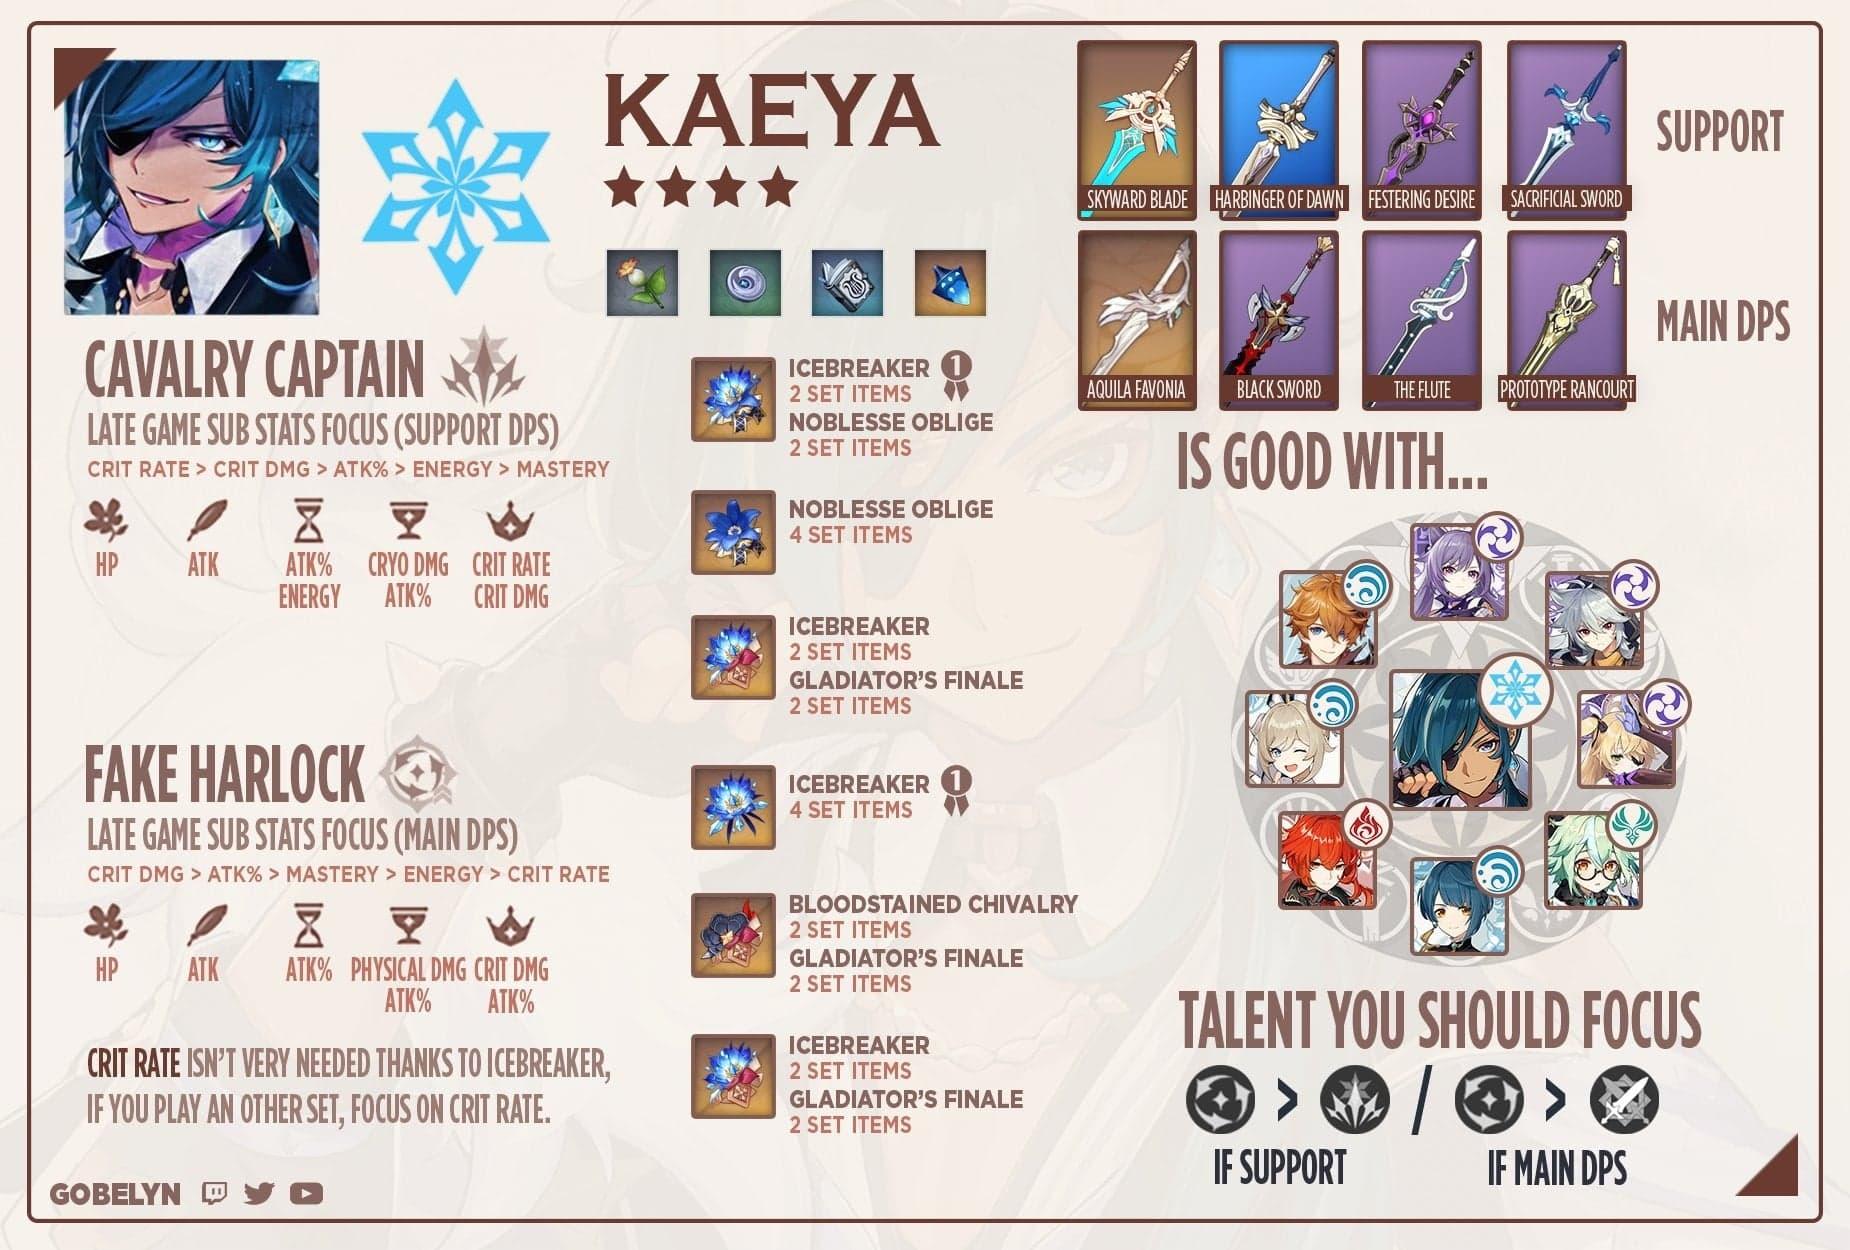 physical kaeya build